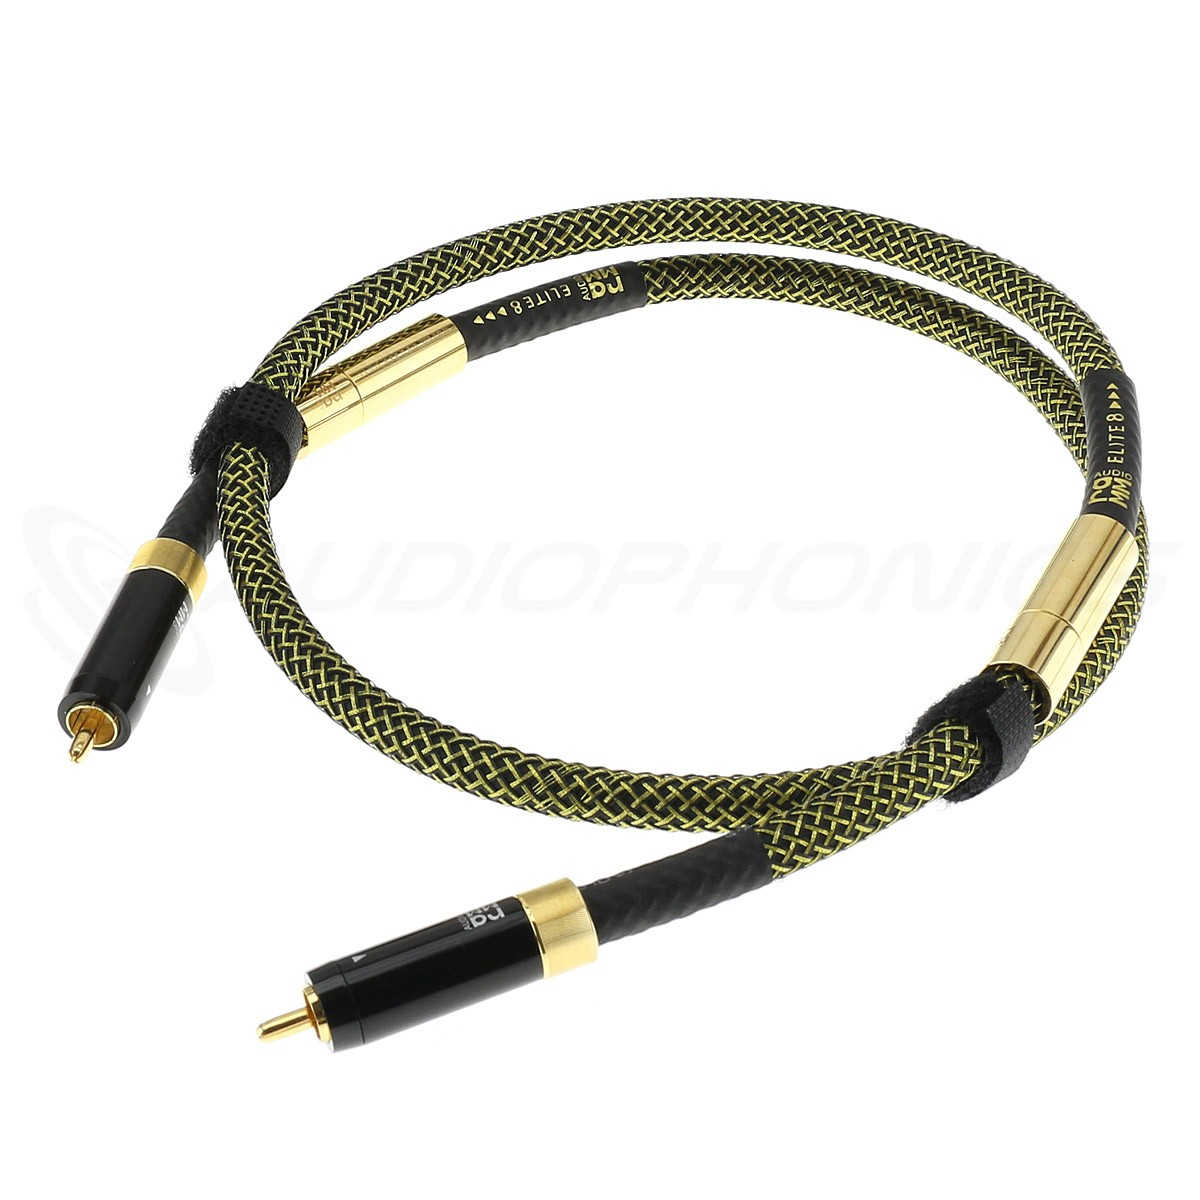 RAMM AUDIO ELITE8 PREMIUM RCA Cables OCC Copper Cryo NBU Floating Ground Gold Plated 1m (Pair)